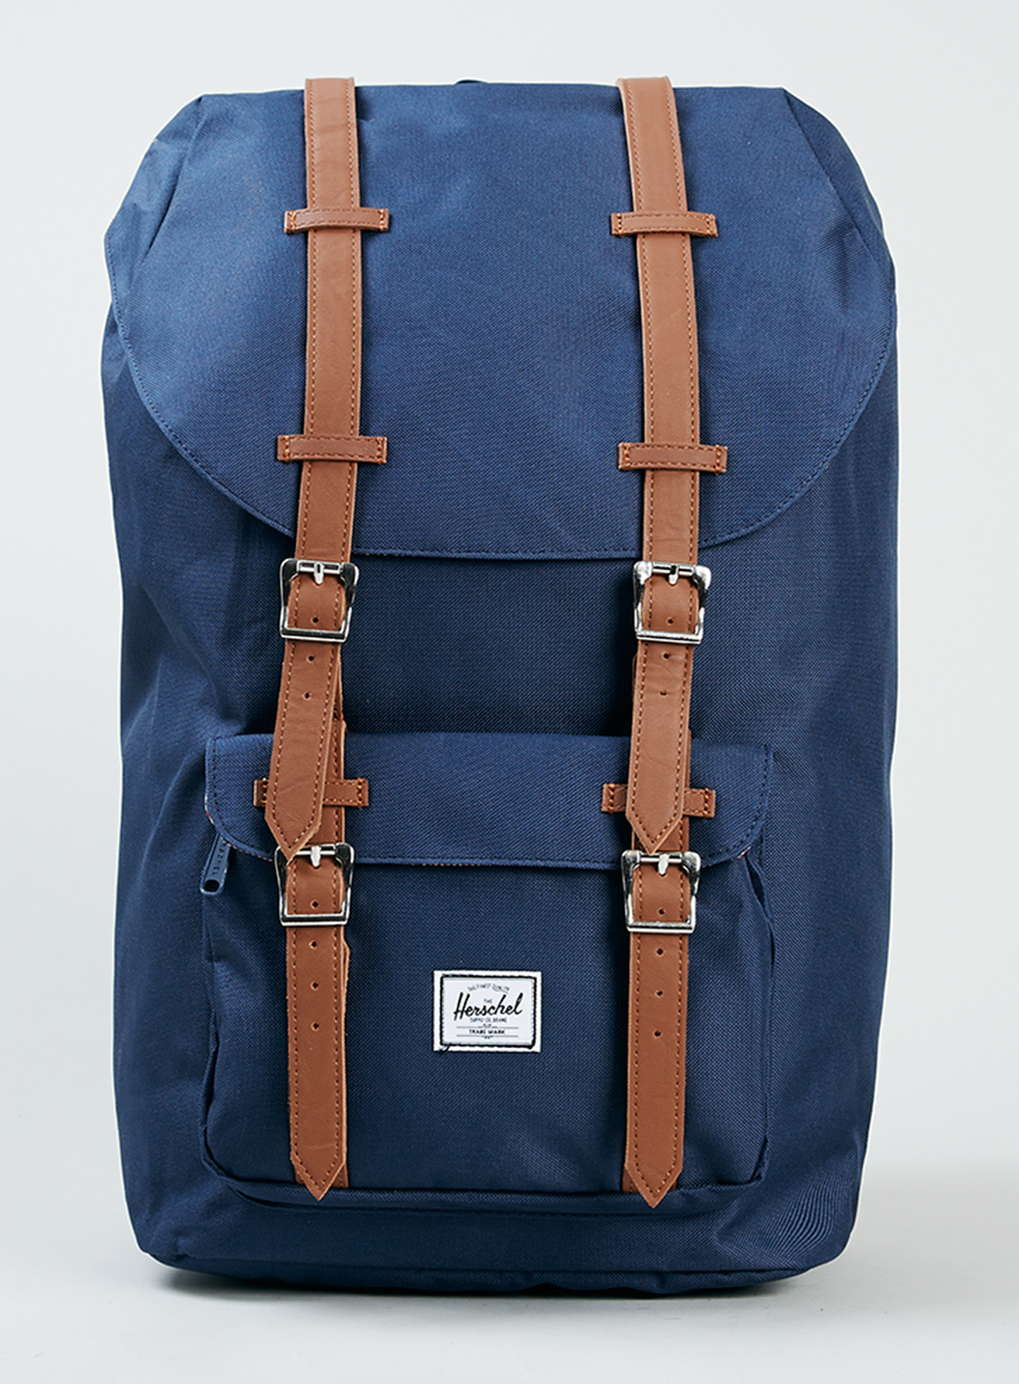 topman herschel navy blue little america backpack in blue. Black Bedroom Furniture Sets. Home Design Ideas